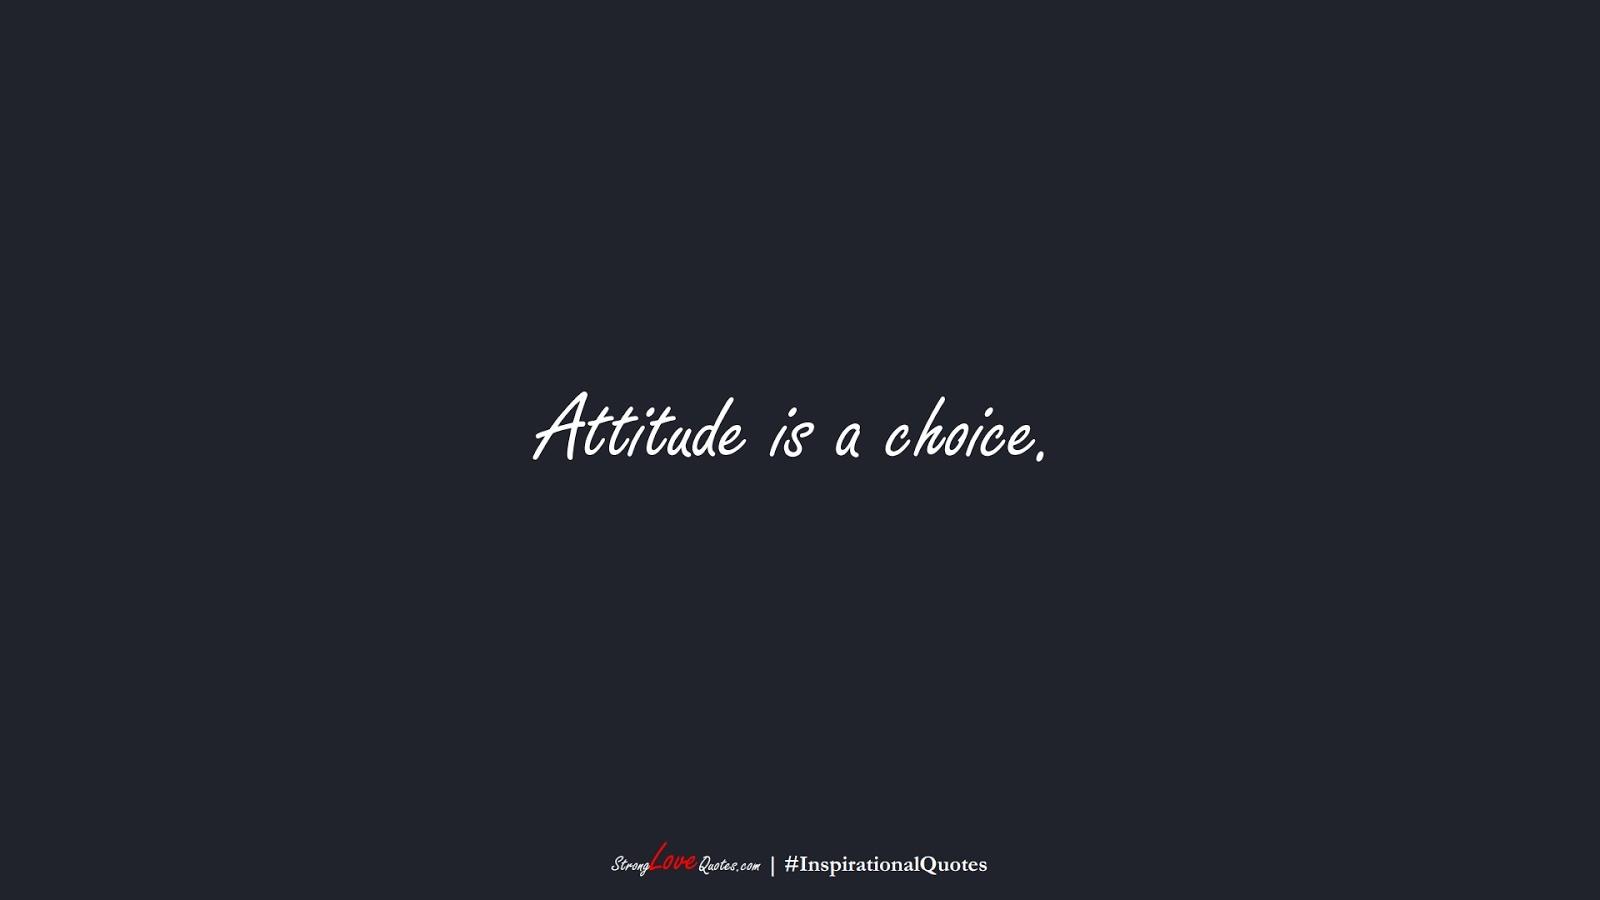 Attitude is a choice.FALSE